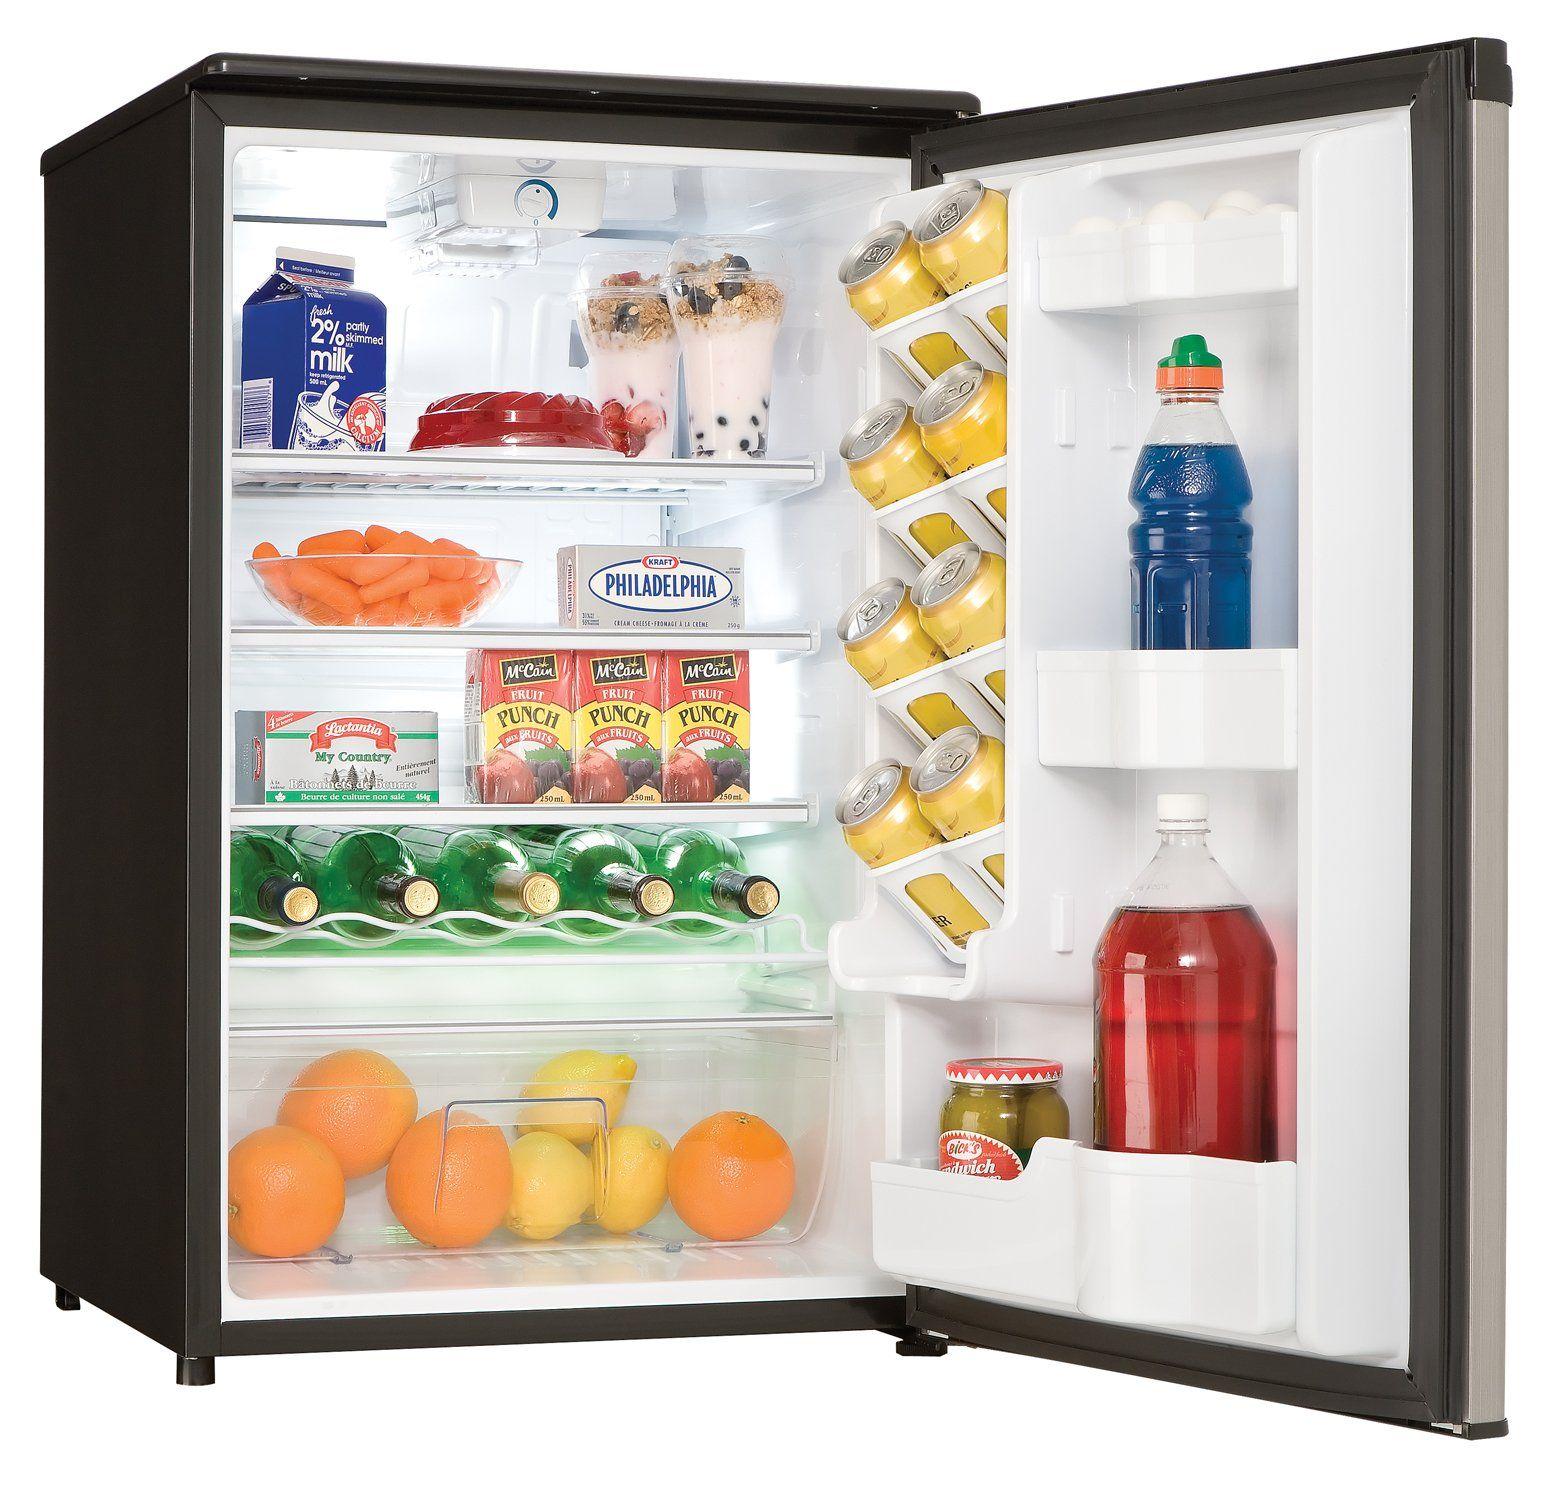 Best Refrigerator Without Freezer Reviews The Ultimate Guide 2015 Refrigerator Without Freezer Compact Fridge Best Refrigerator